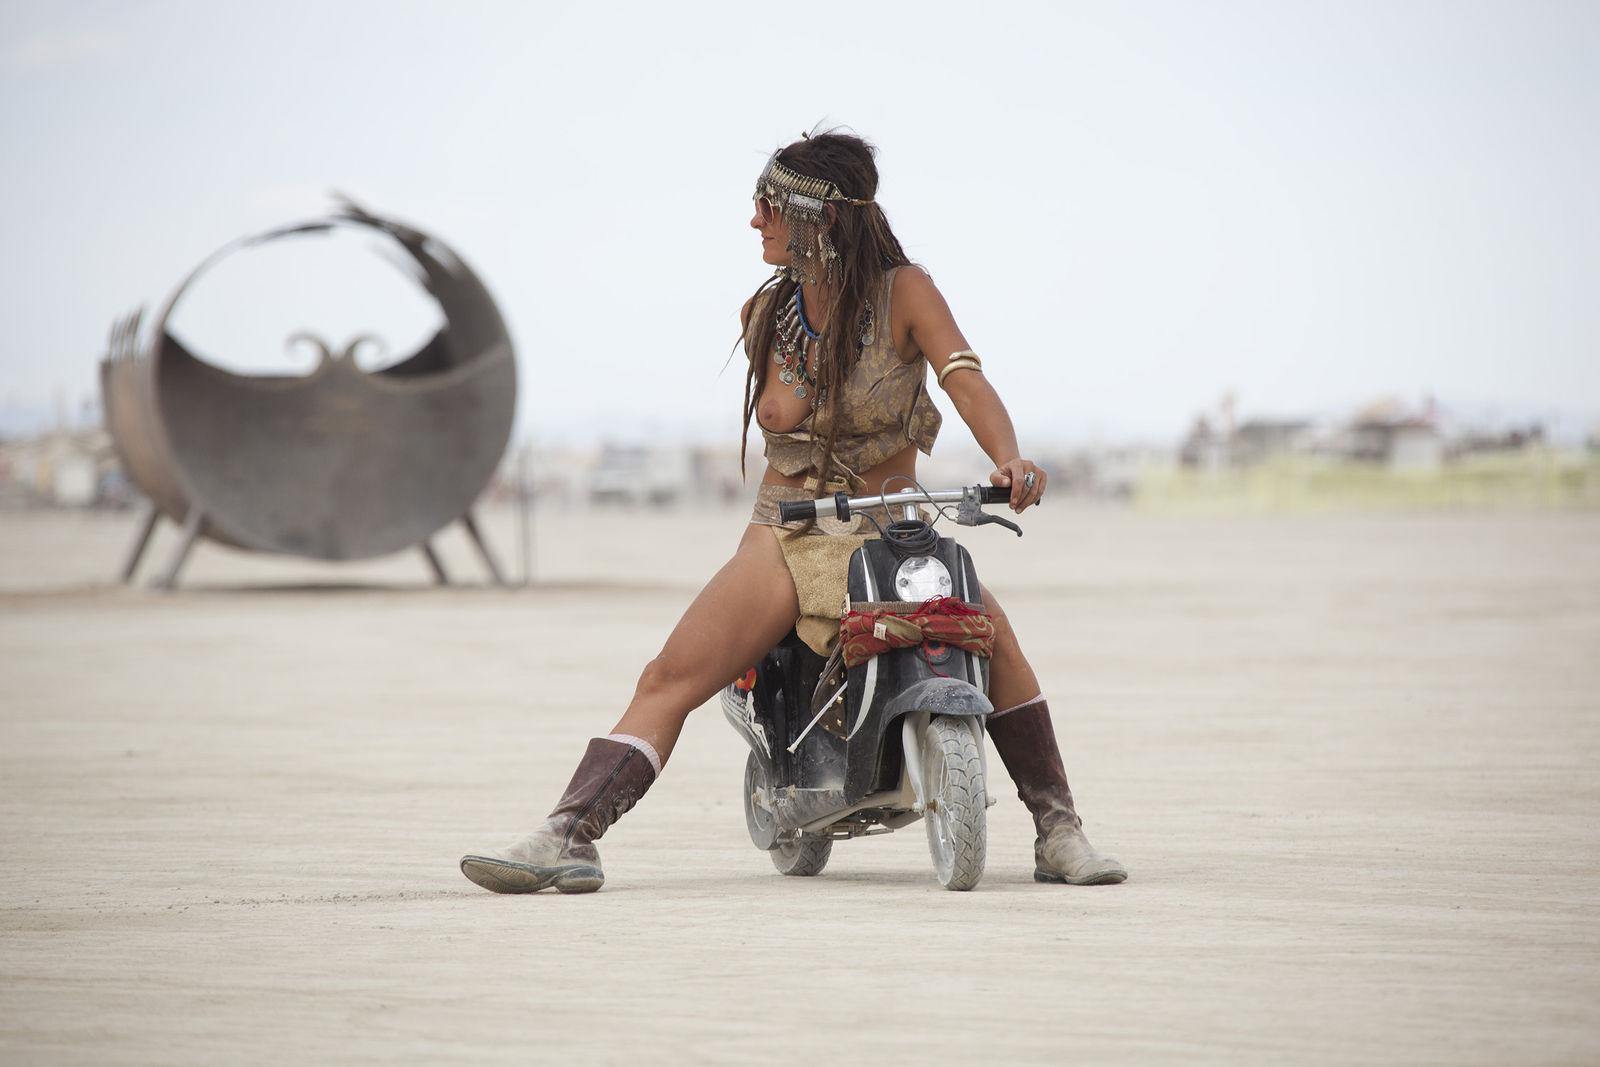 Pavel Antonov. Burning Man. City of Sand. _MG_5431-Edit copy